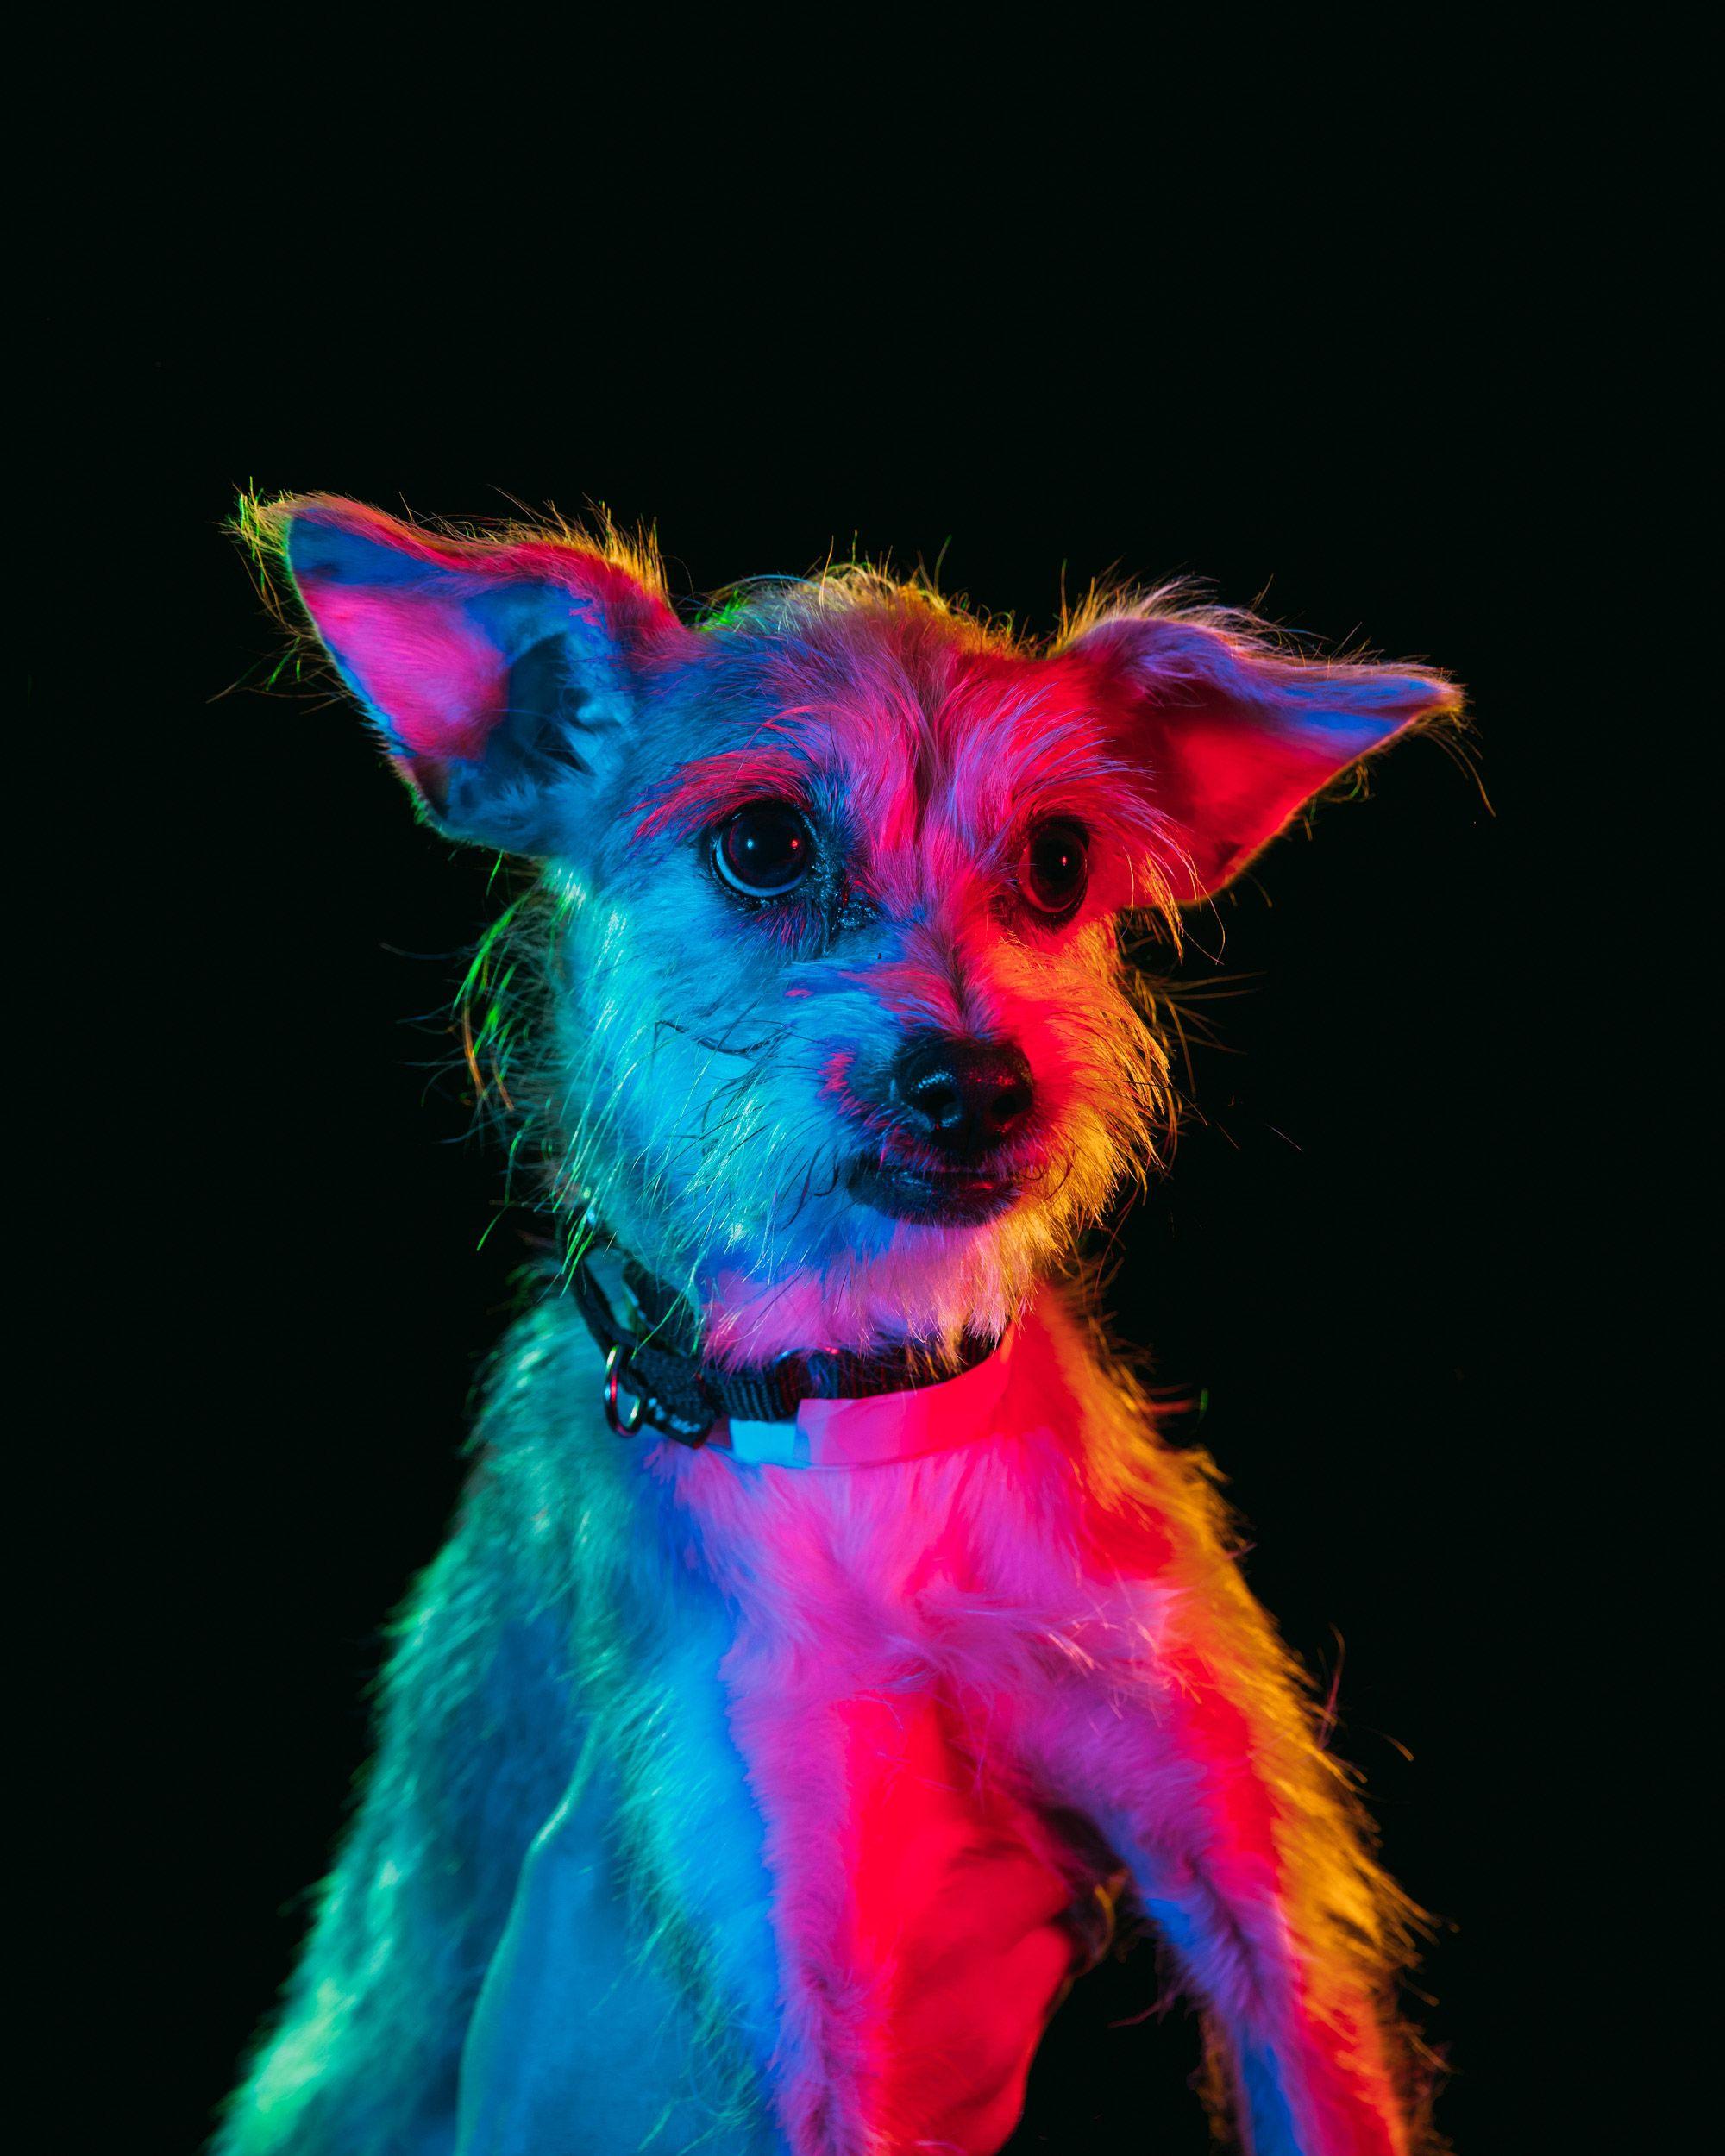 Photographer Paul Octavious Uses Vibrant Hue Lighting To Spotlight Adoptable Shelter Dogs Dog Photograph Colorful Portrait Dog Portraits